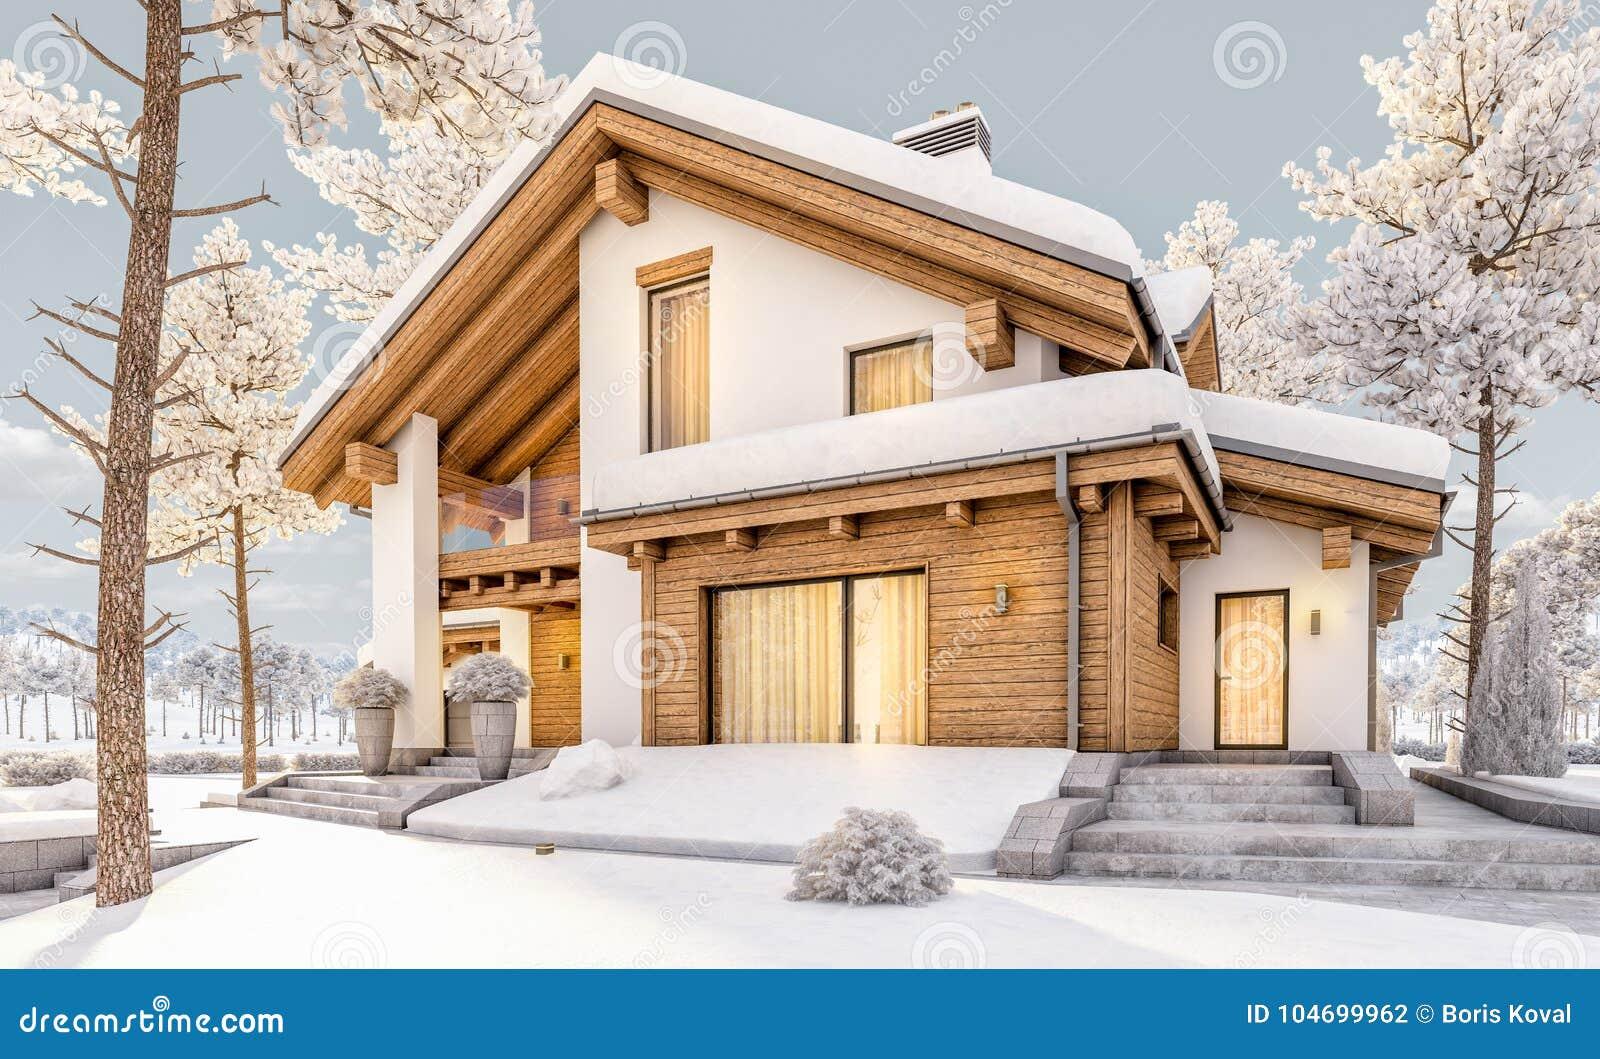 3d rendering of modern cozy house in chalet style stock illustration illustration of design - Moderner chalet stil ...